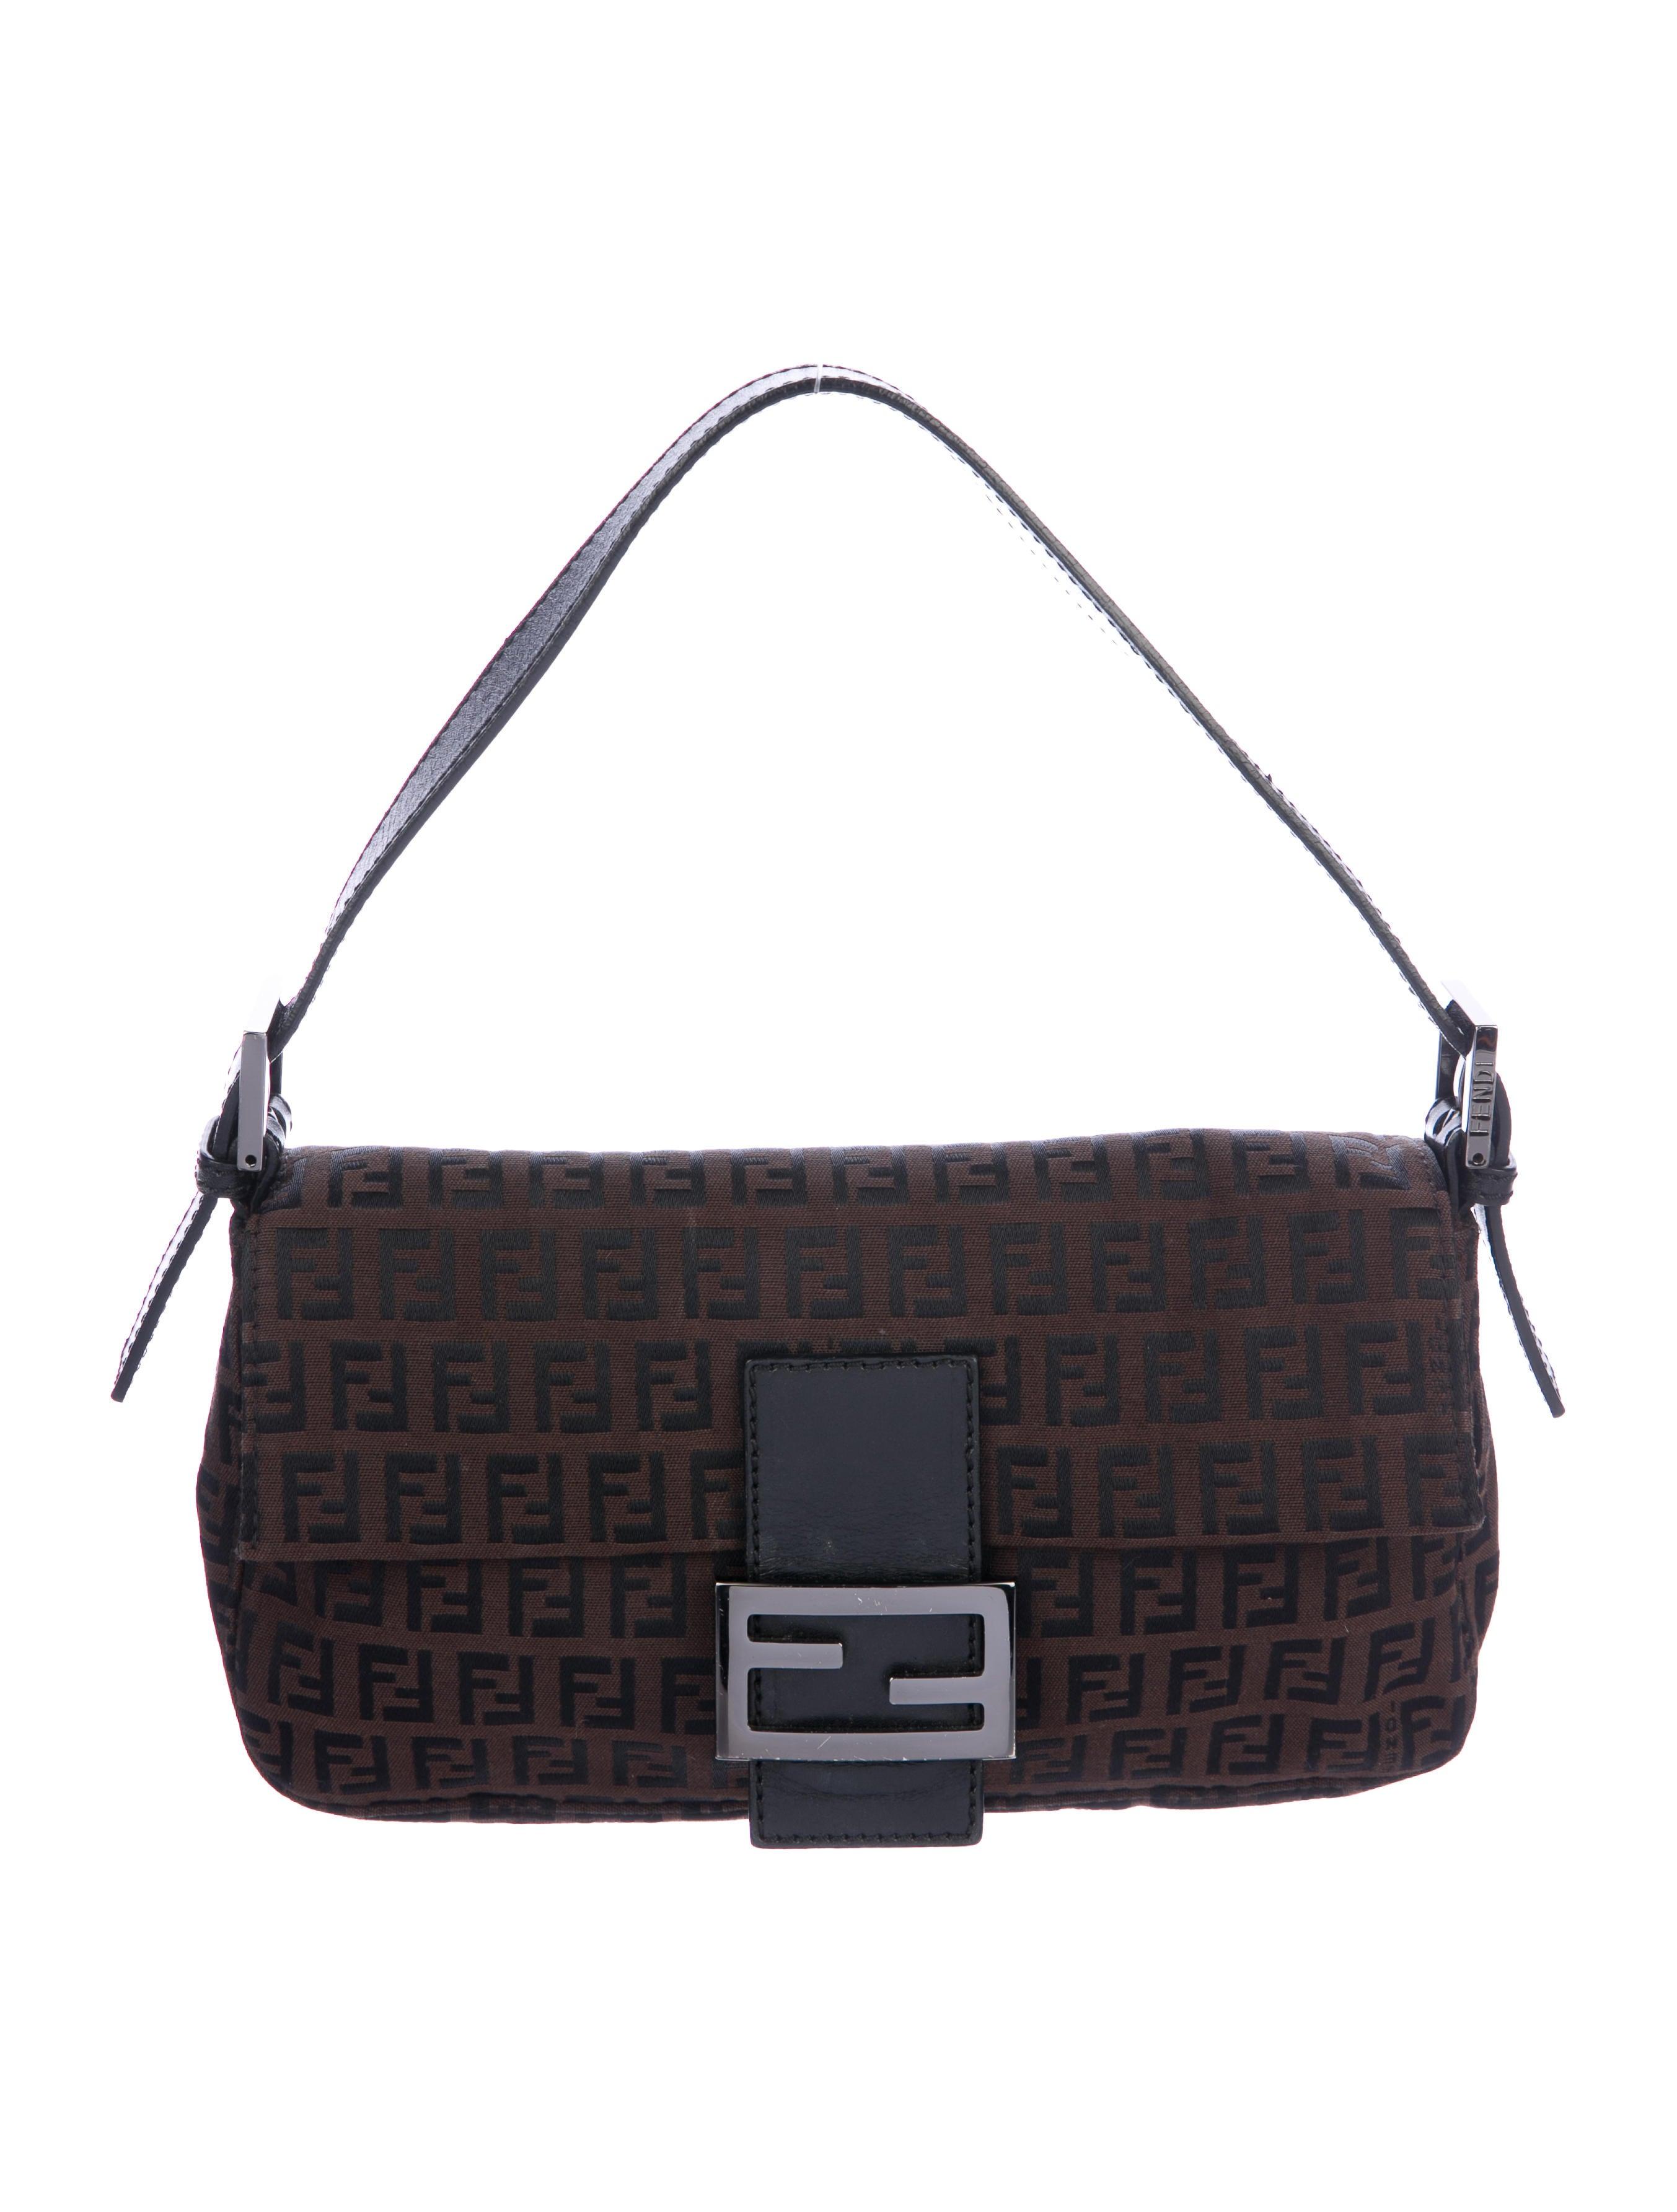 039ecbe960bb Fendi Zucchino Canvas Baguette - Handbags - FEN80797